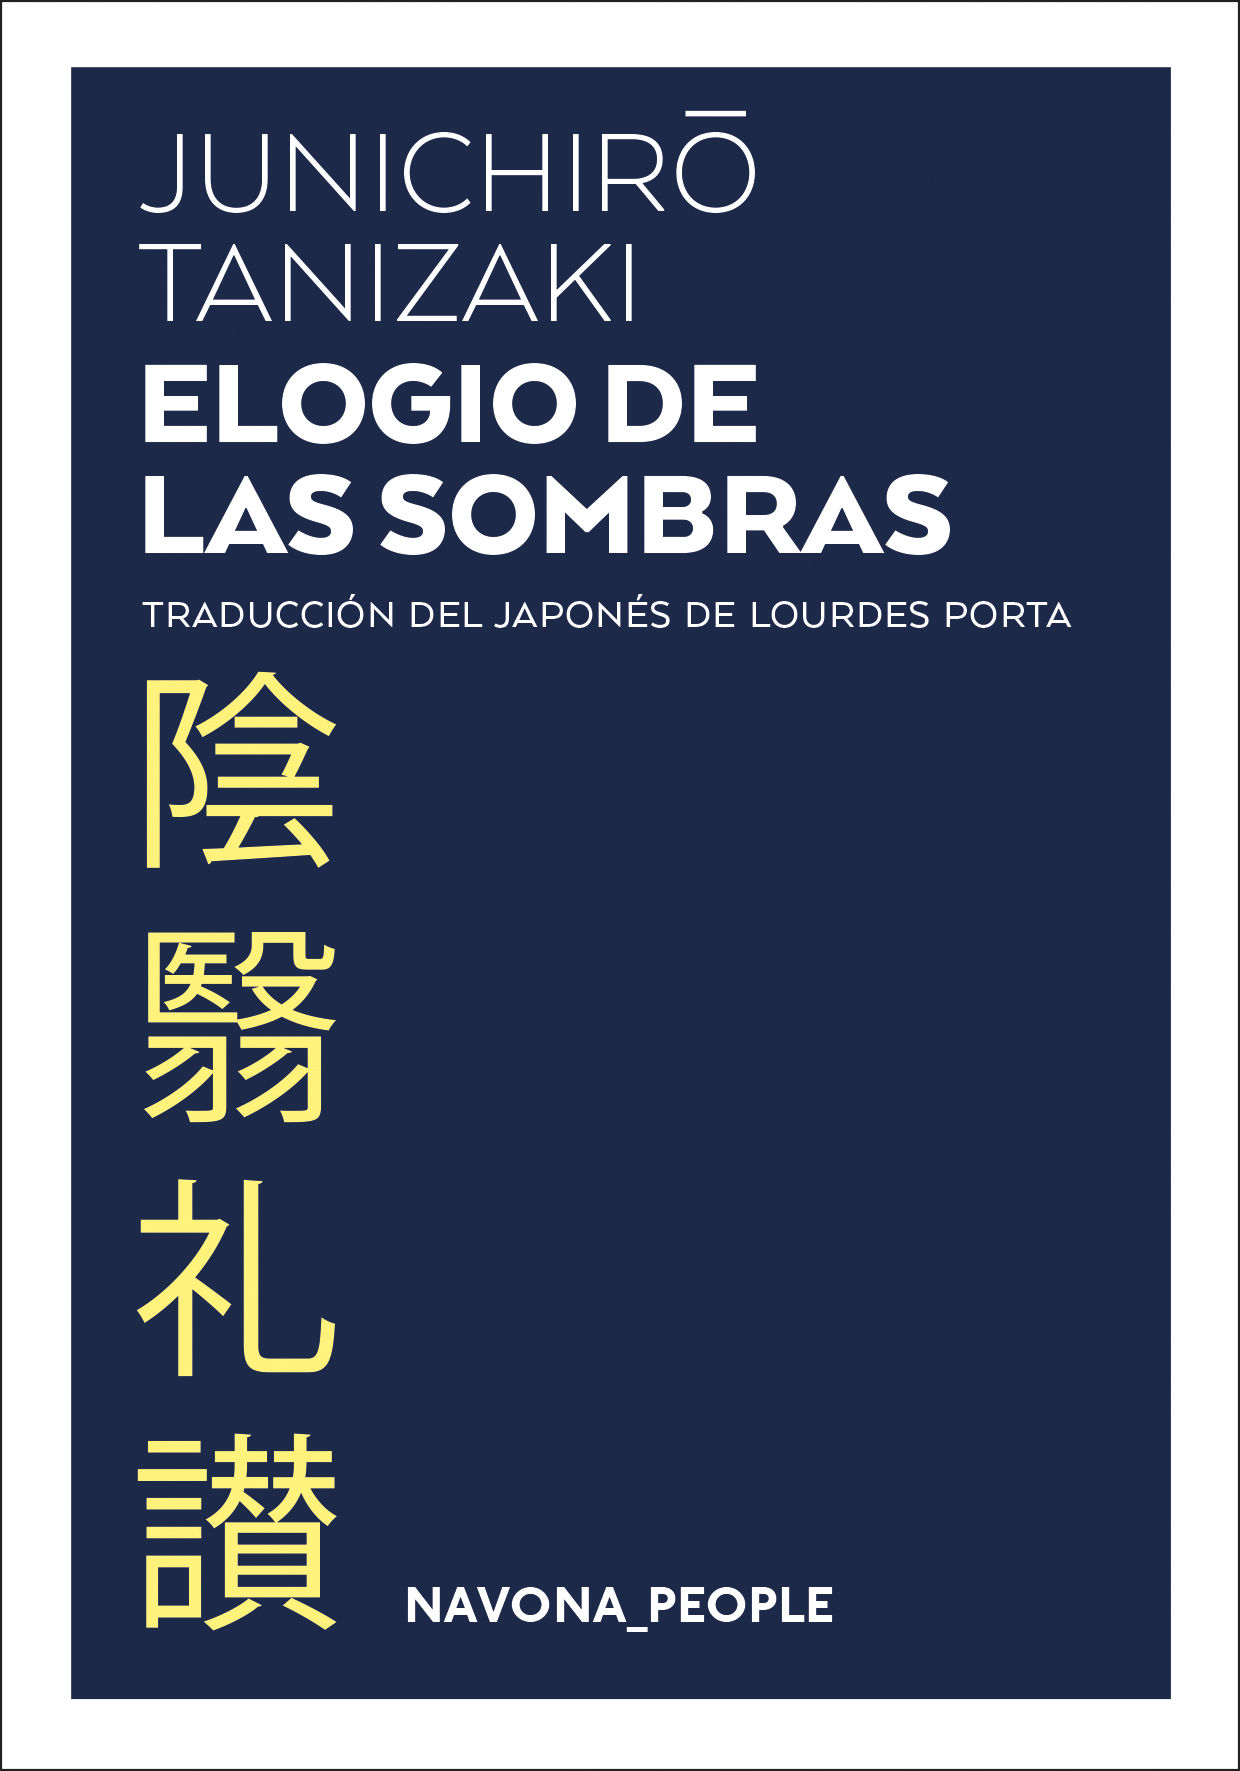 ELOGIO DE LAS SOMBRAS - NE